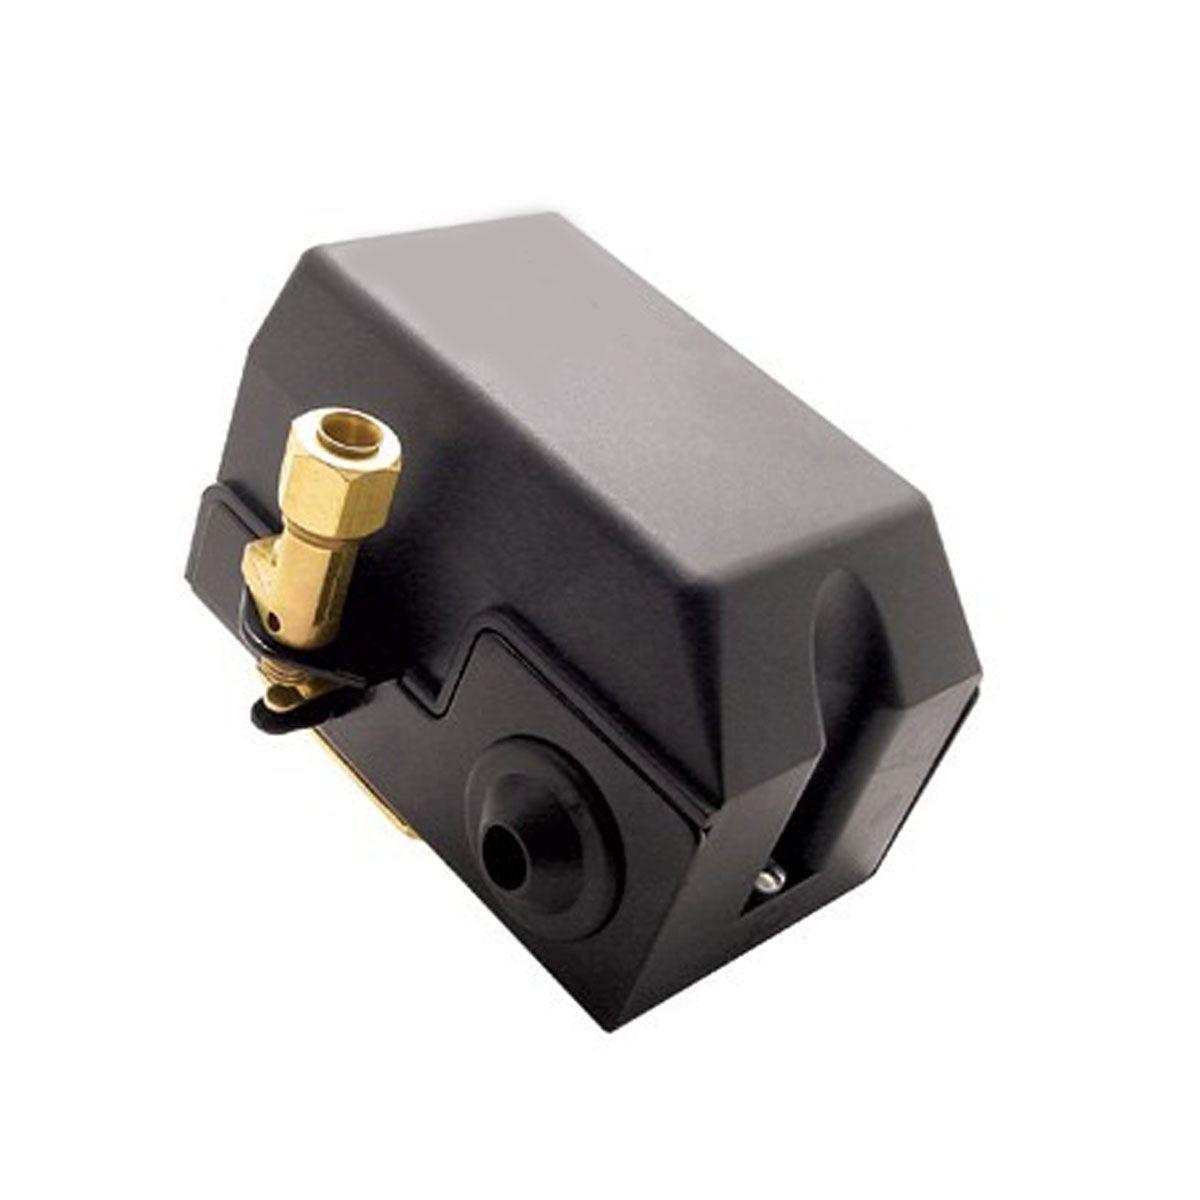 Pressostato Compressor Automático Alavanca 100 - 140 psi 1 via